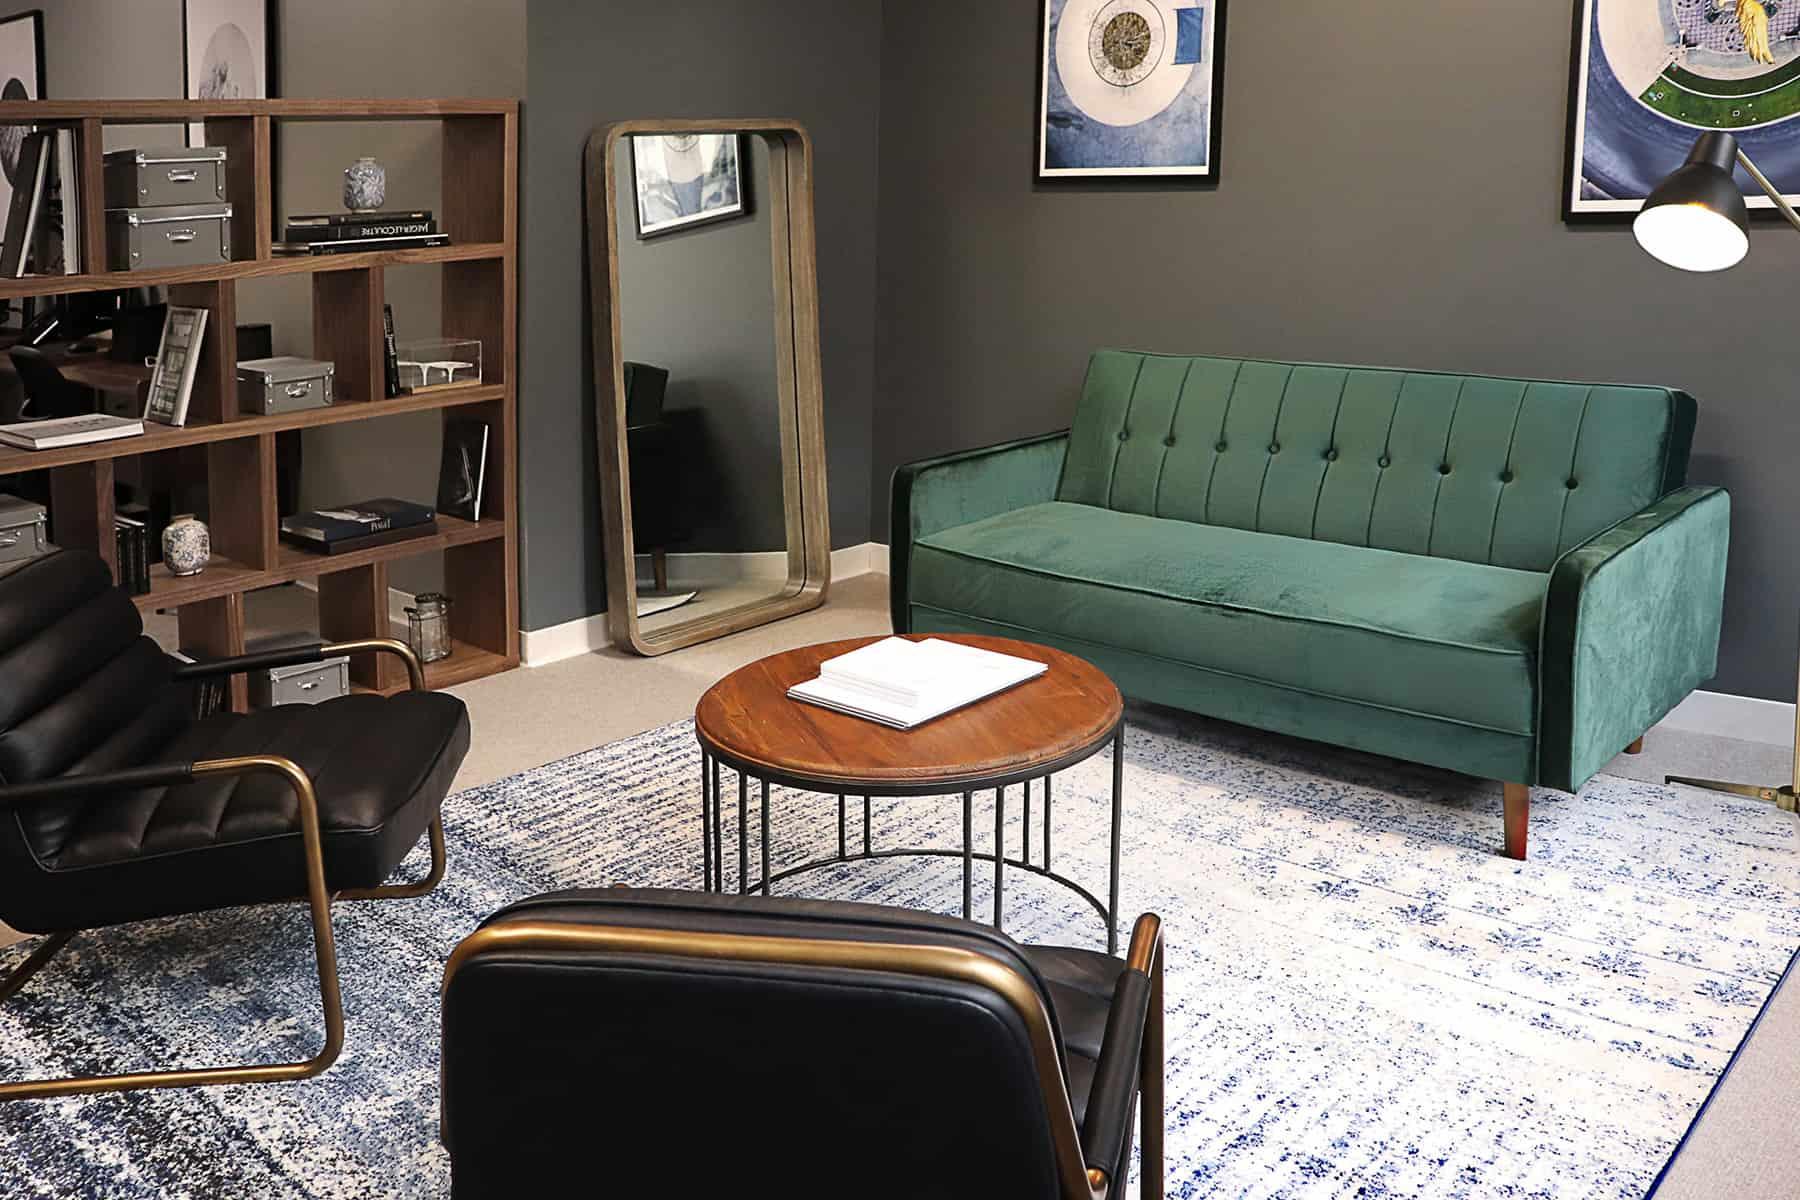 Watchfinder & Co. New York Showroom interior